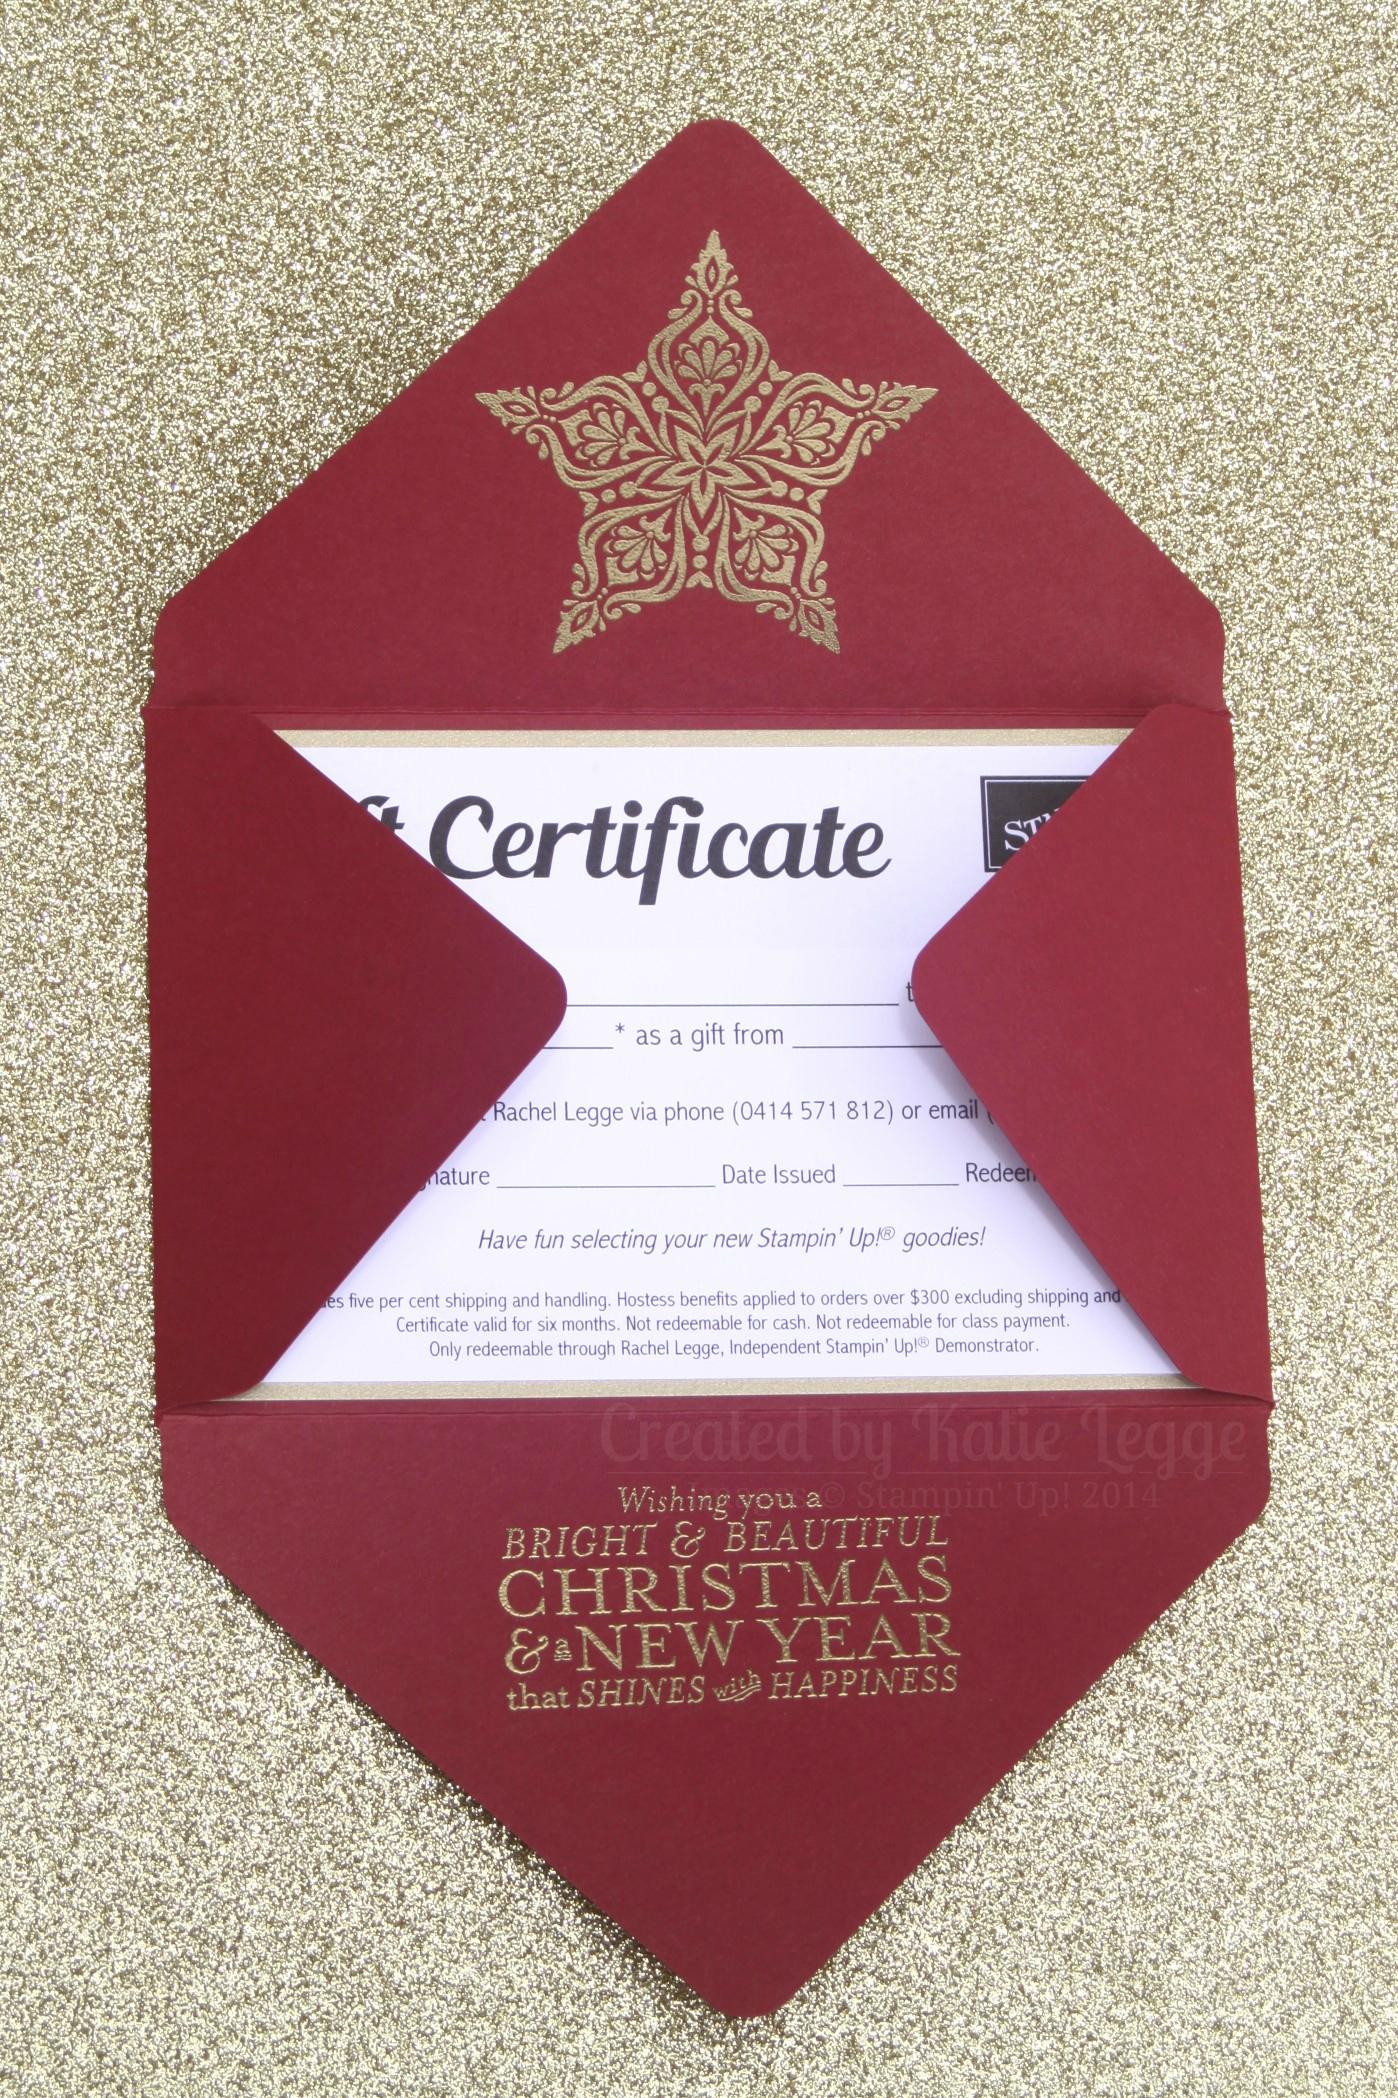 stampin up christmas gift certificate half opened envelope katie